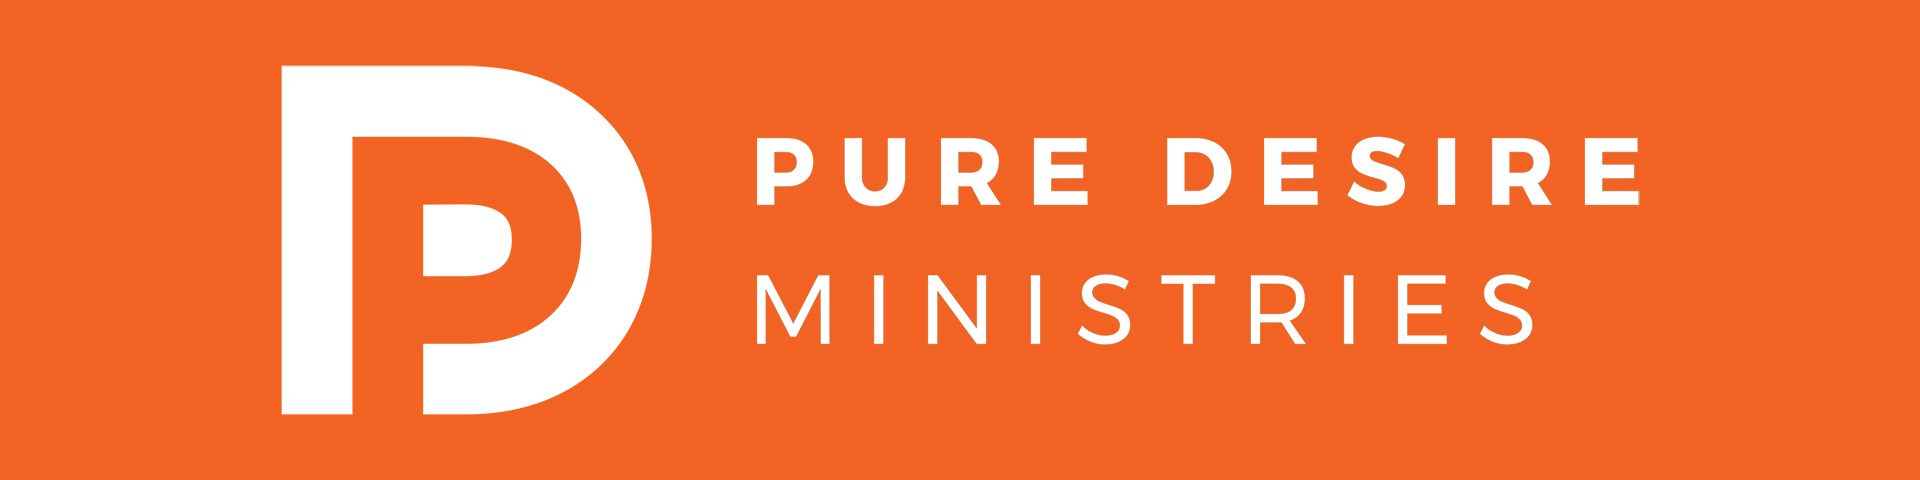 pure desire logo.jpg